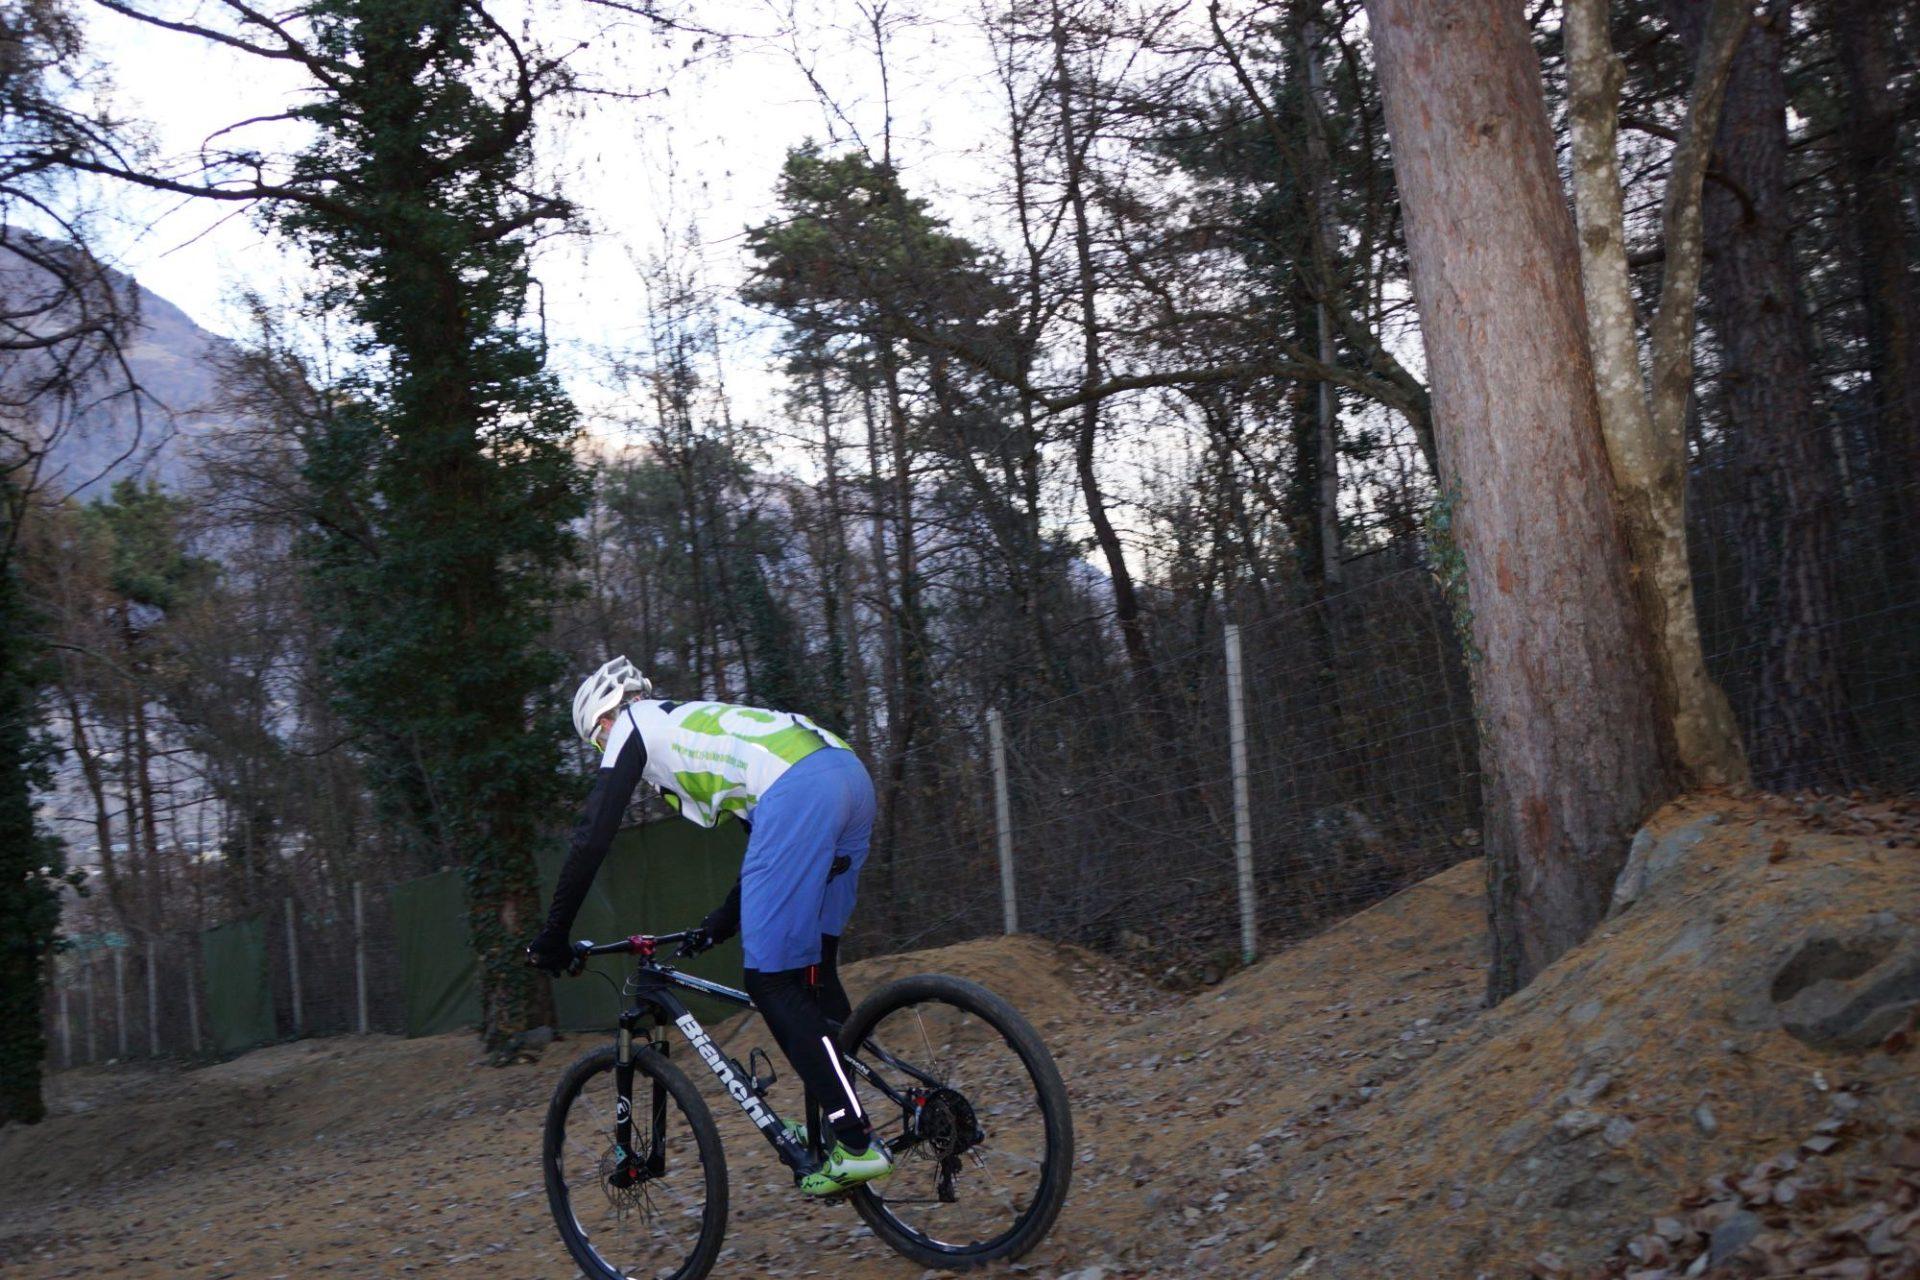 Bergsteigertipp MTB Bergab 04 I (c) OetziBikeAcqademy